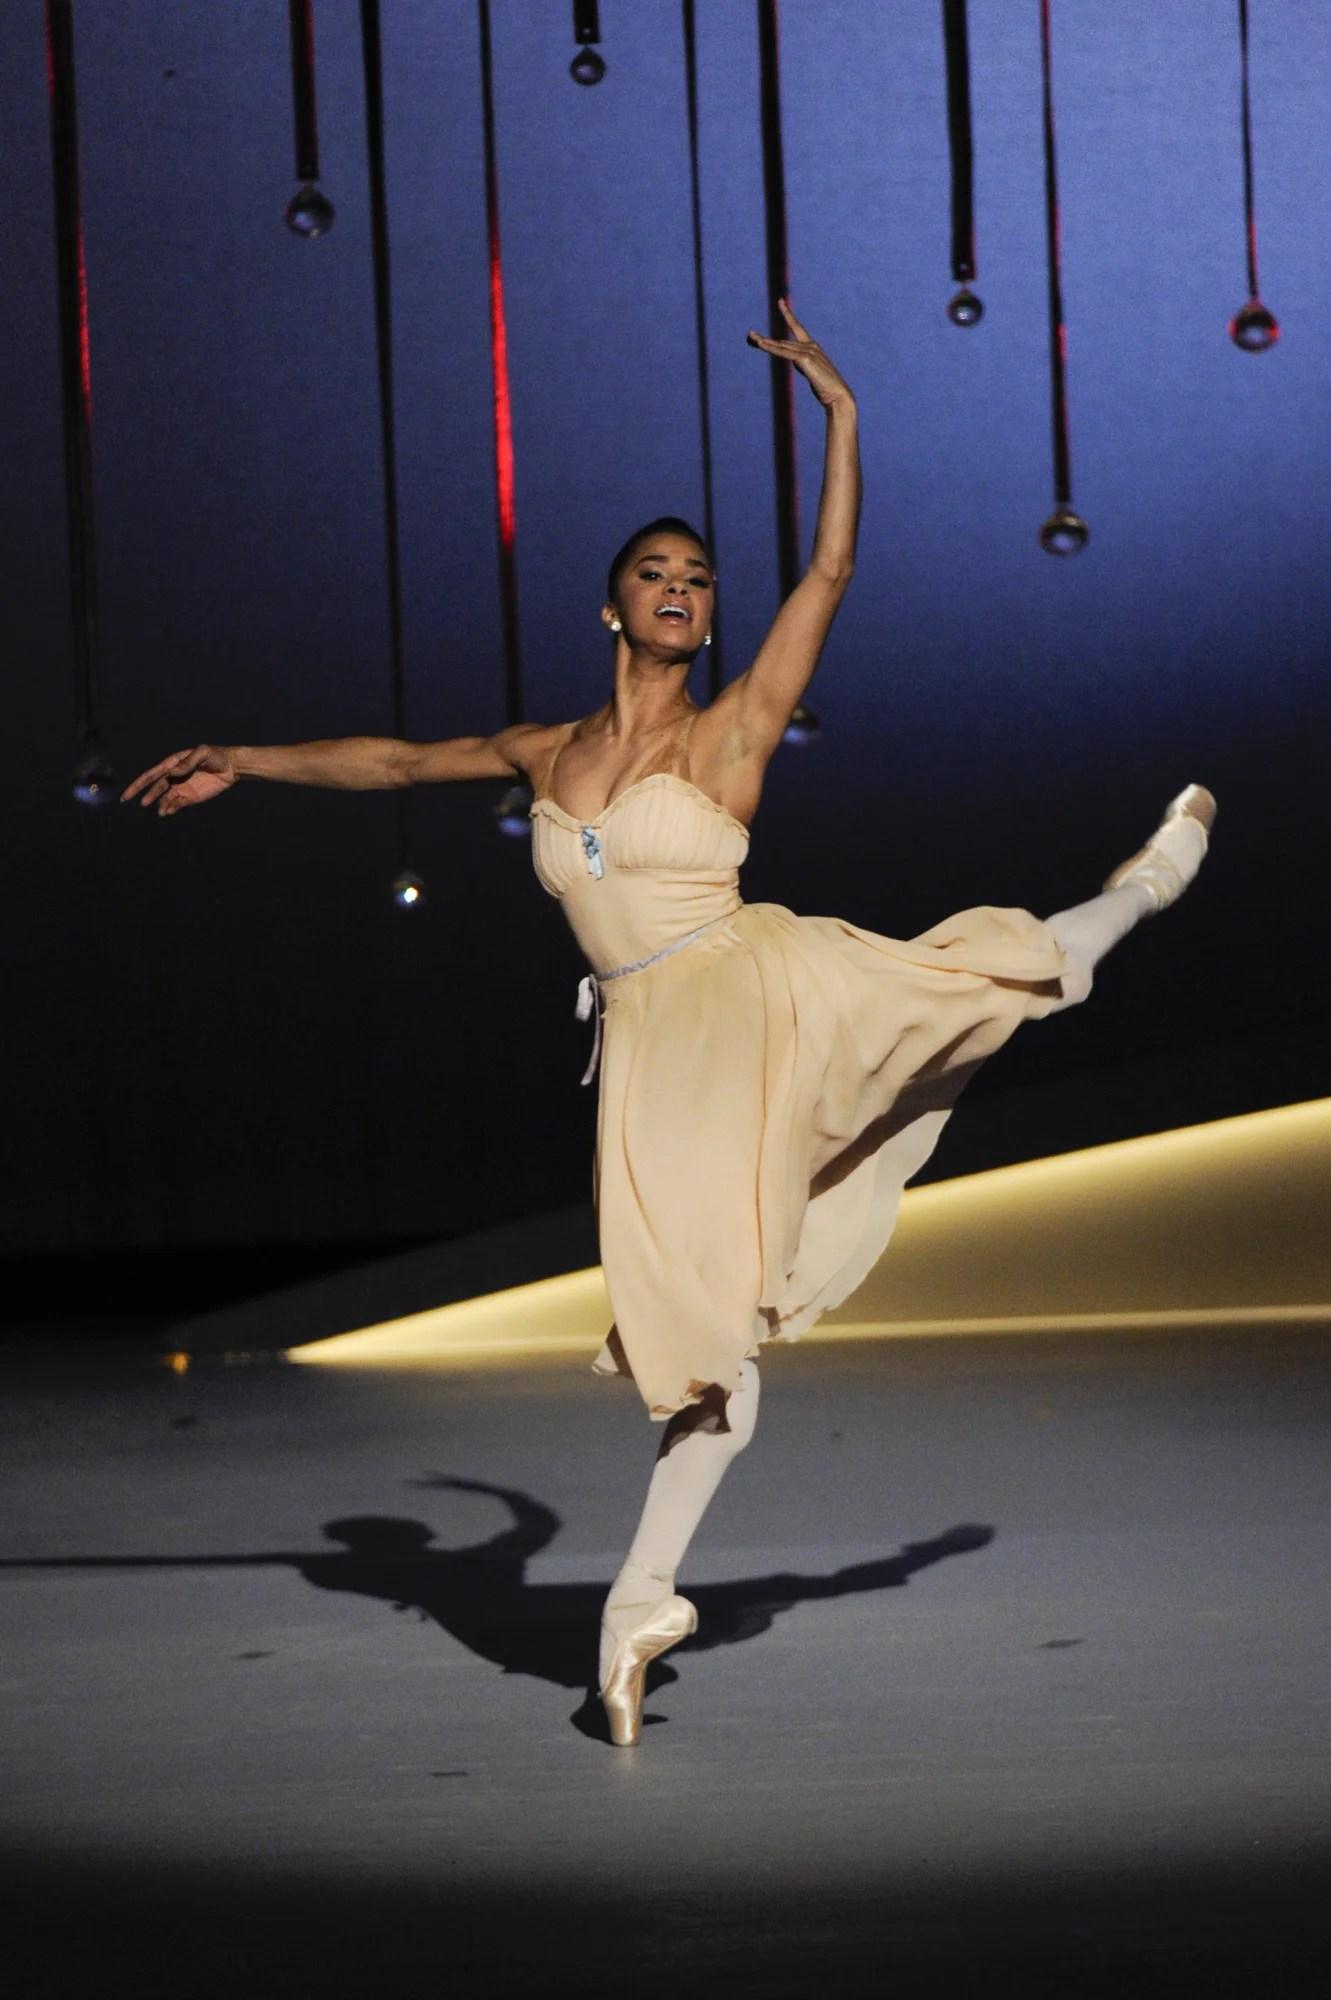 Misty Copeland Becomes First Black Principal Ballerina At